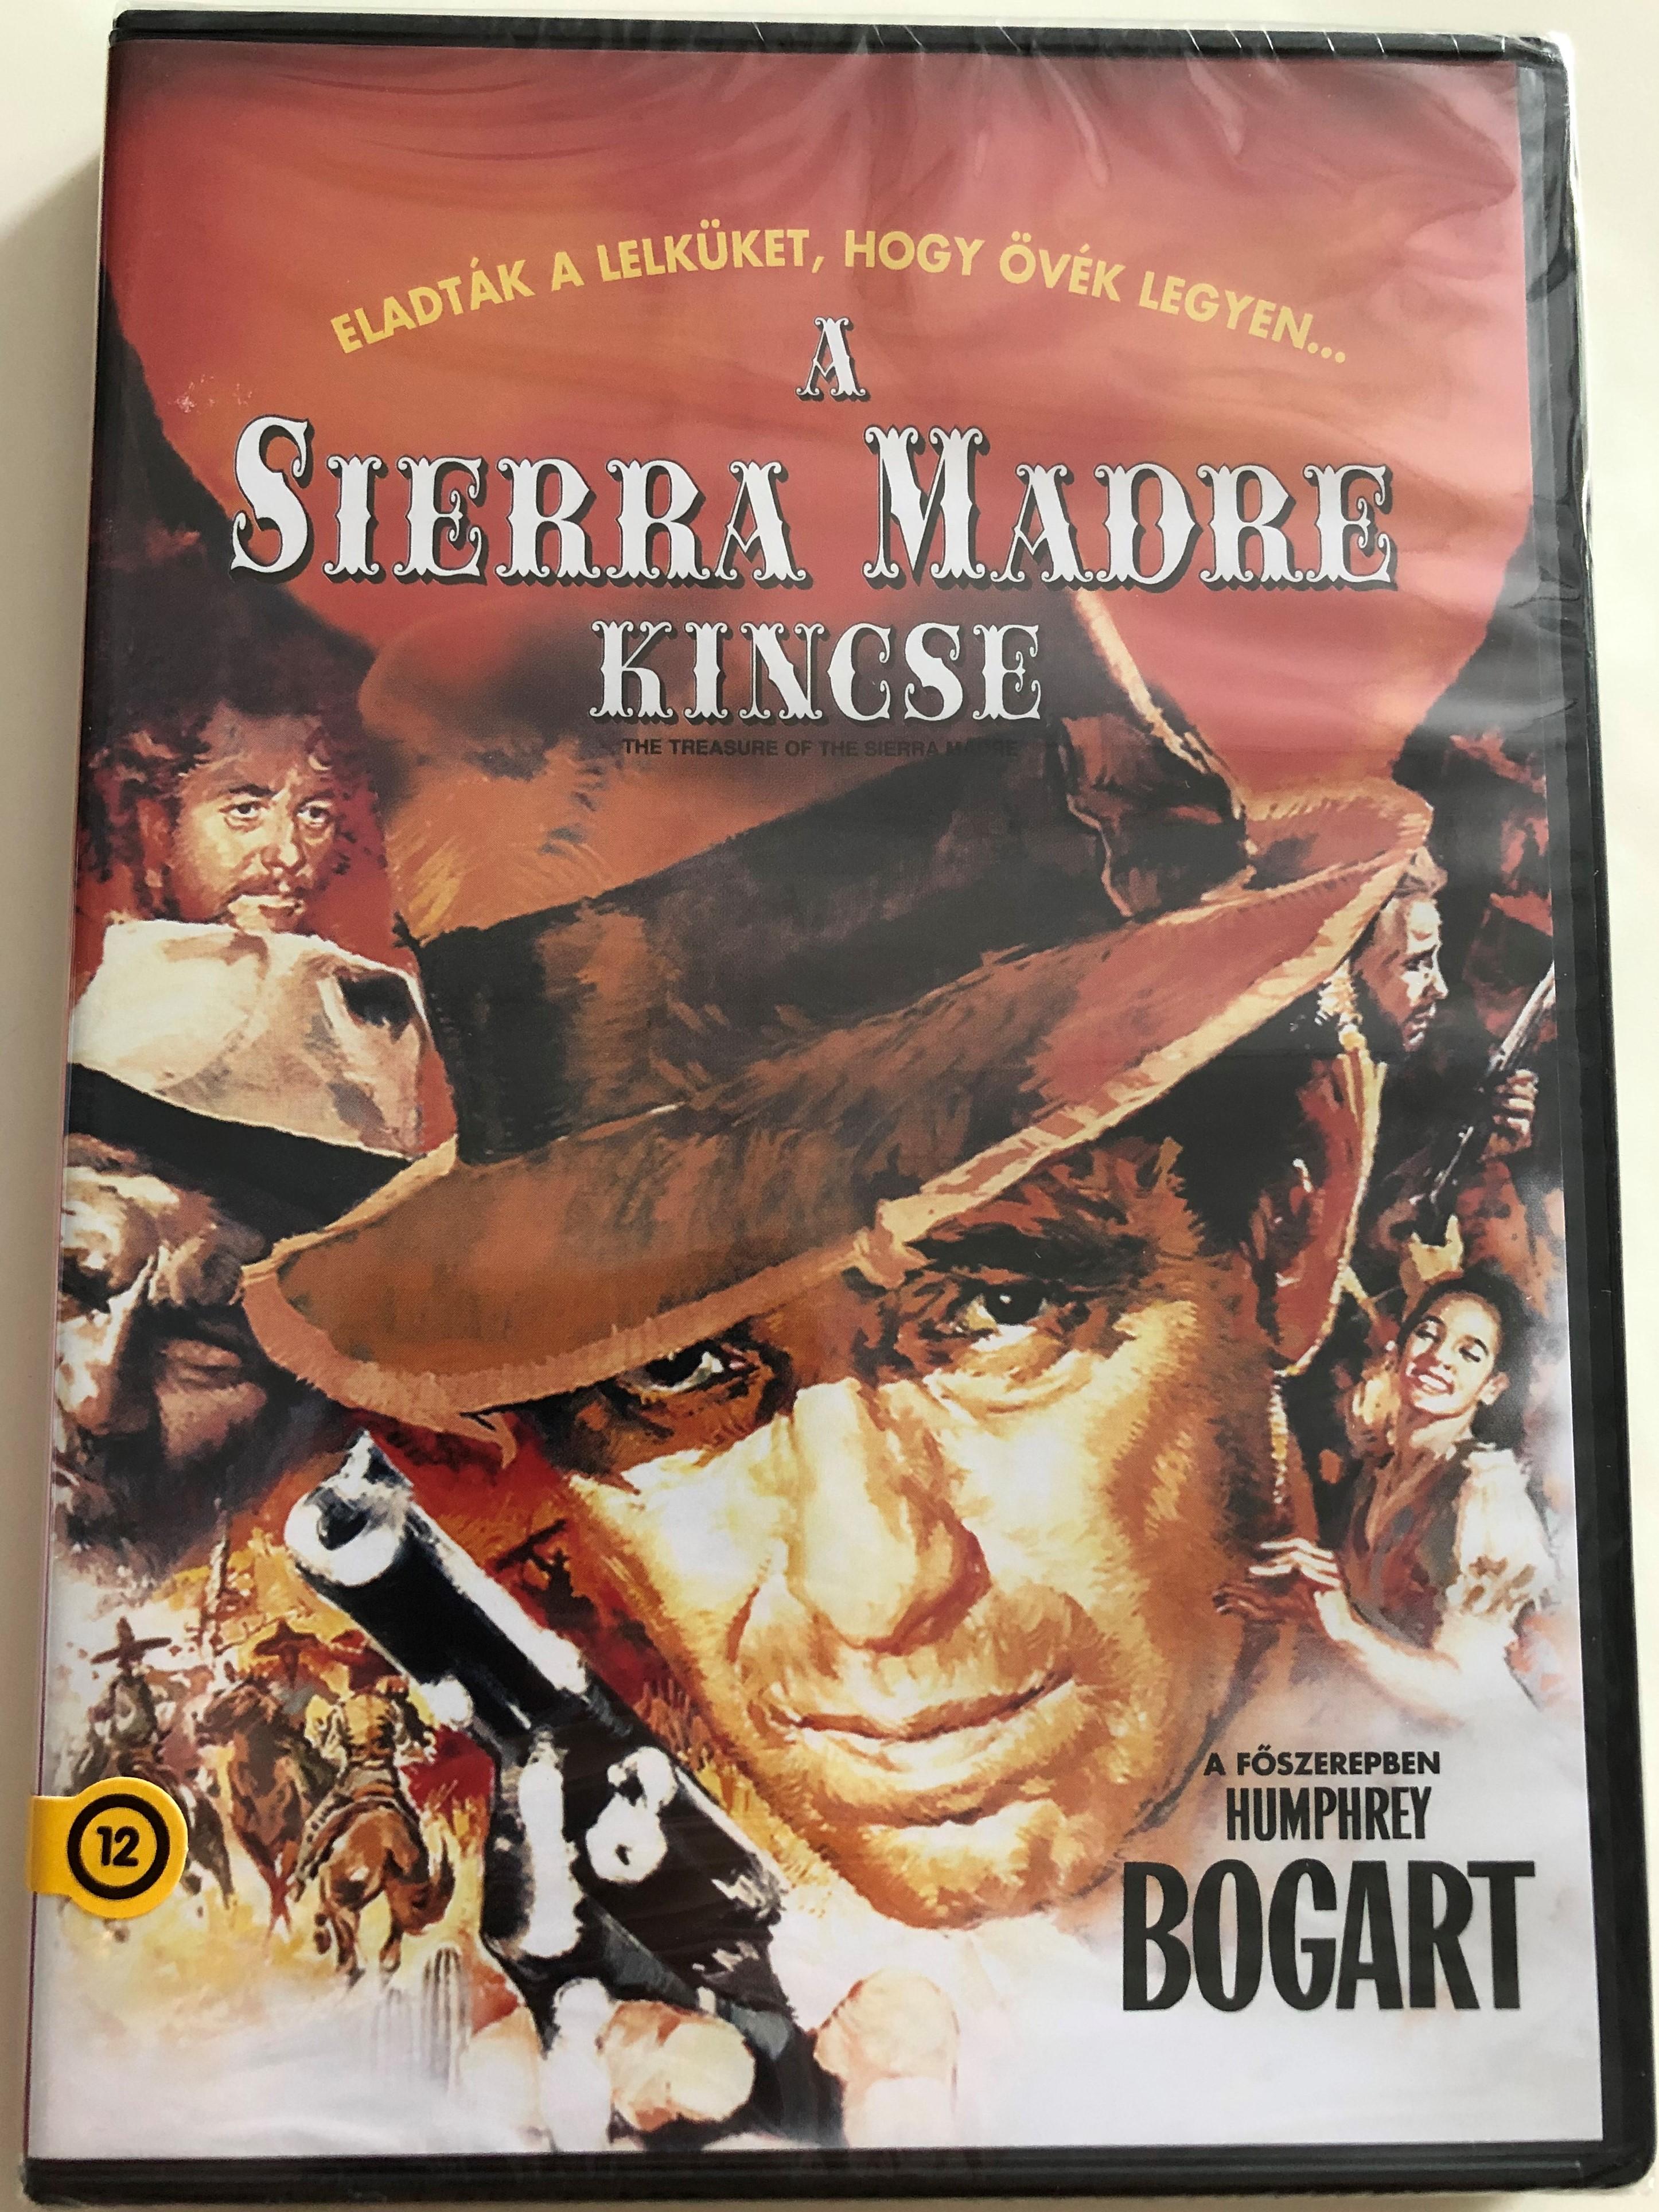 thre-treasure-of-the-sierra-madre-dvd-1947-a-sierra-madre-kincse-directed-by-john-huston-starring-humphrey-bogart-walter-huston-tim-holt-bruce-bennett-bogart-classic-1-.jpg